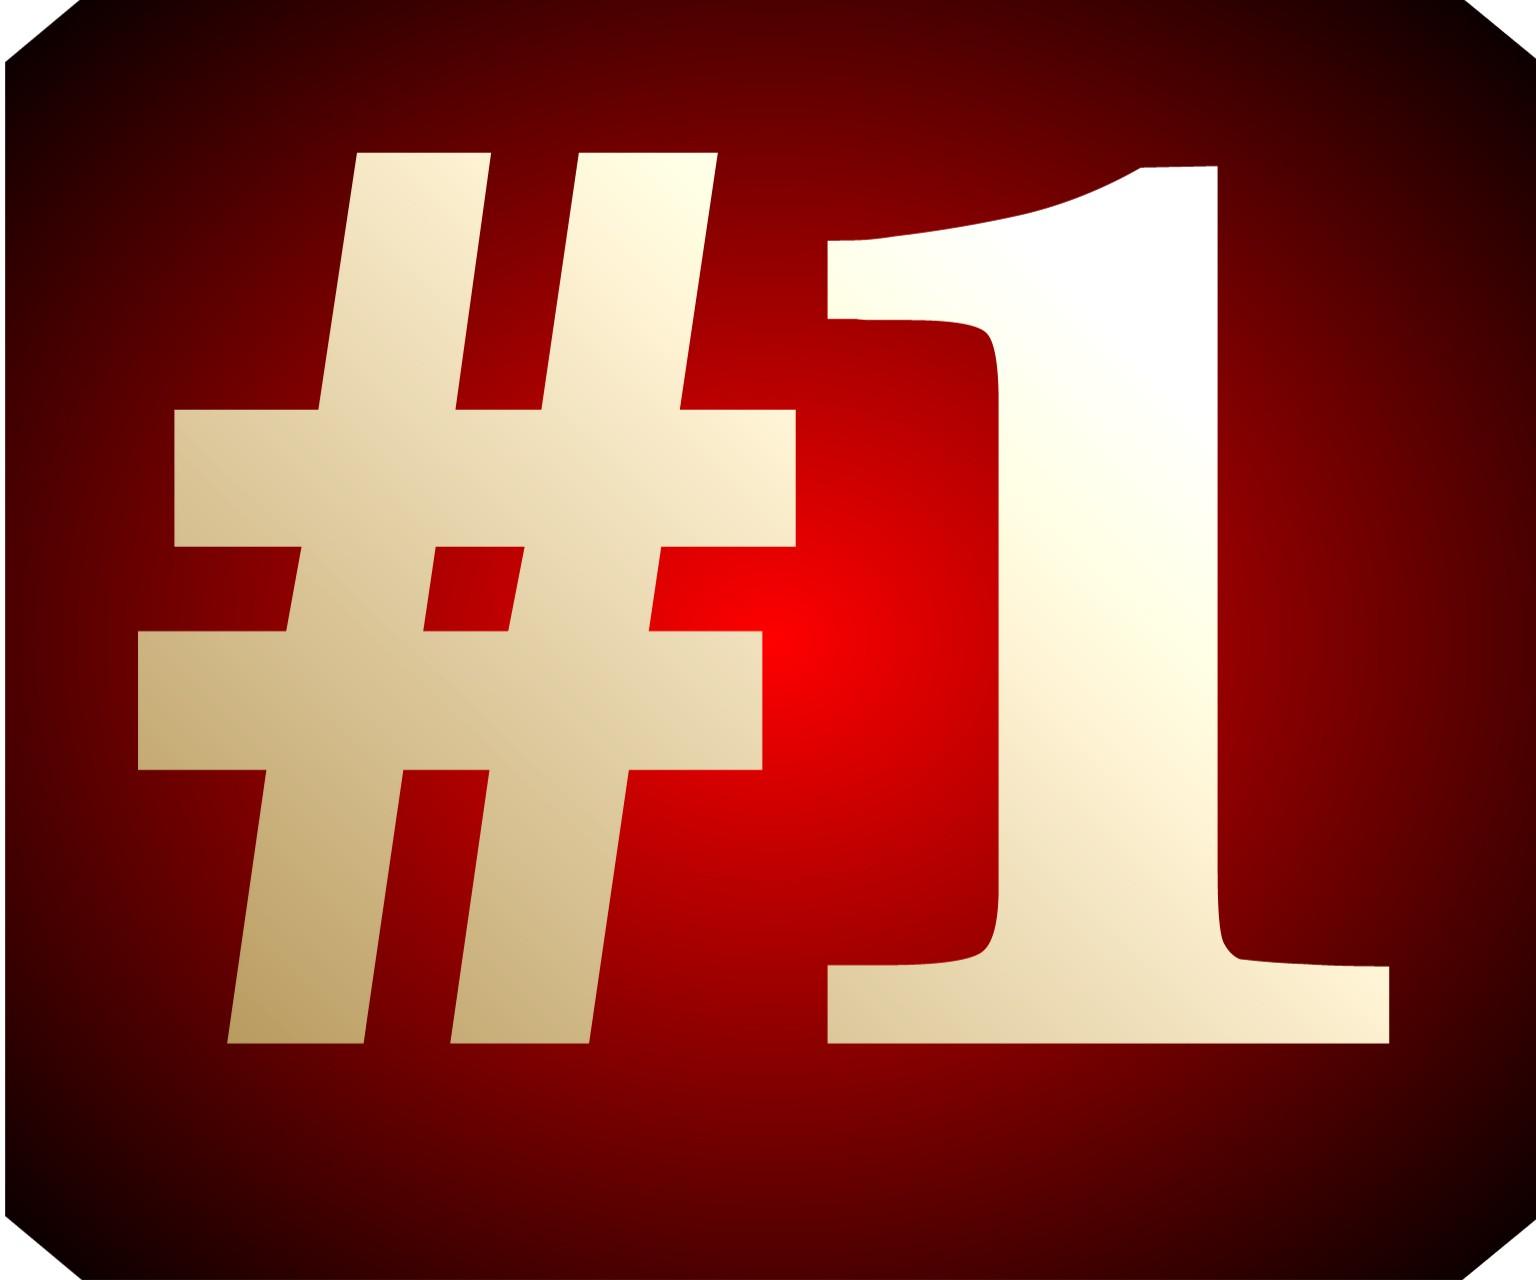 number-1-sign